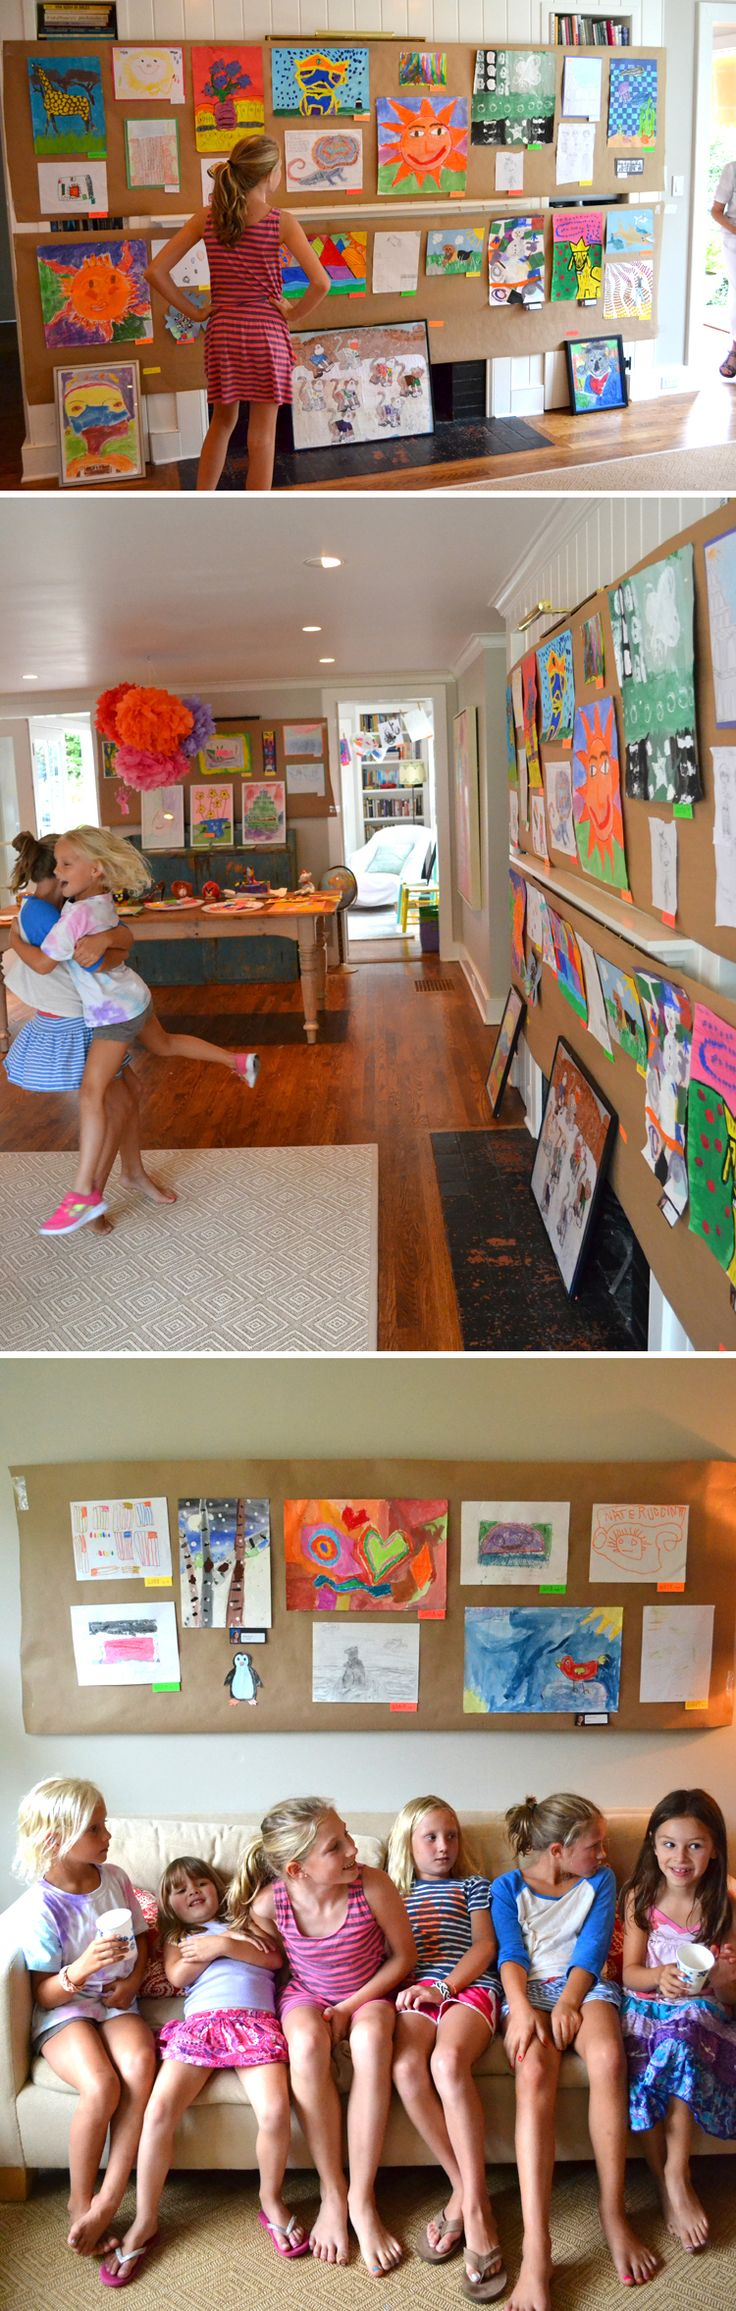 403 best displaying kids art images on pinterest kids crafts